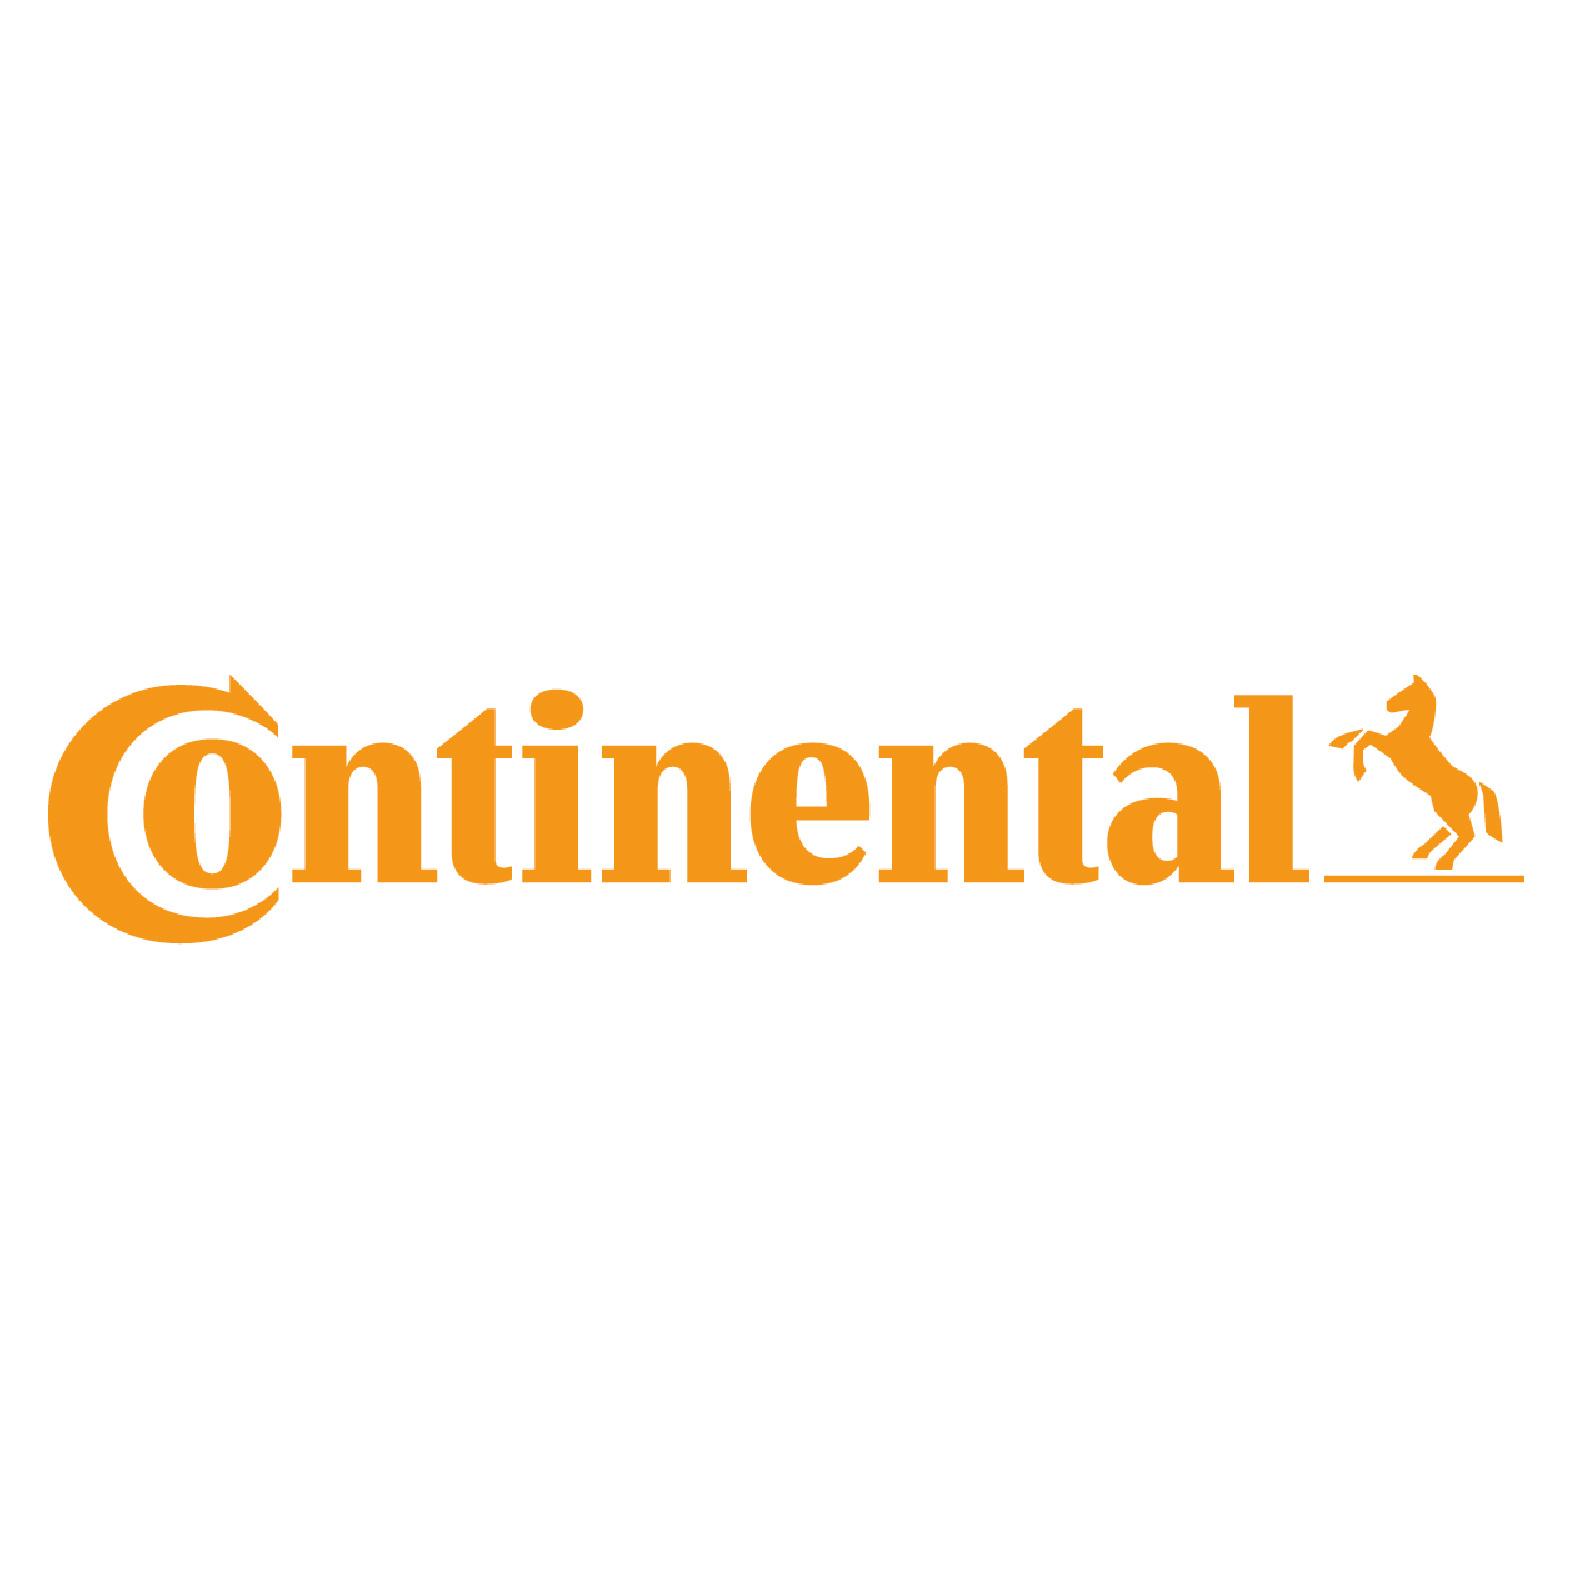 coninental-01